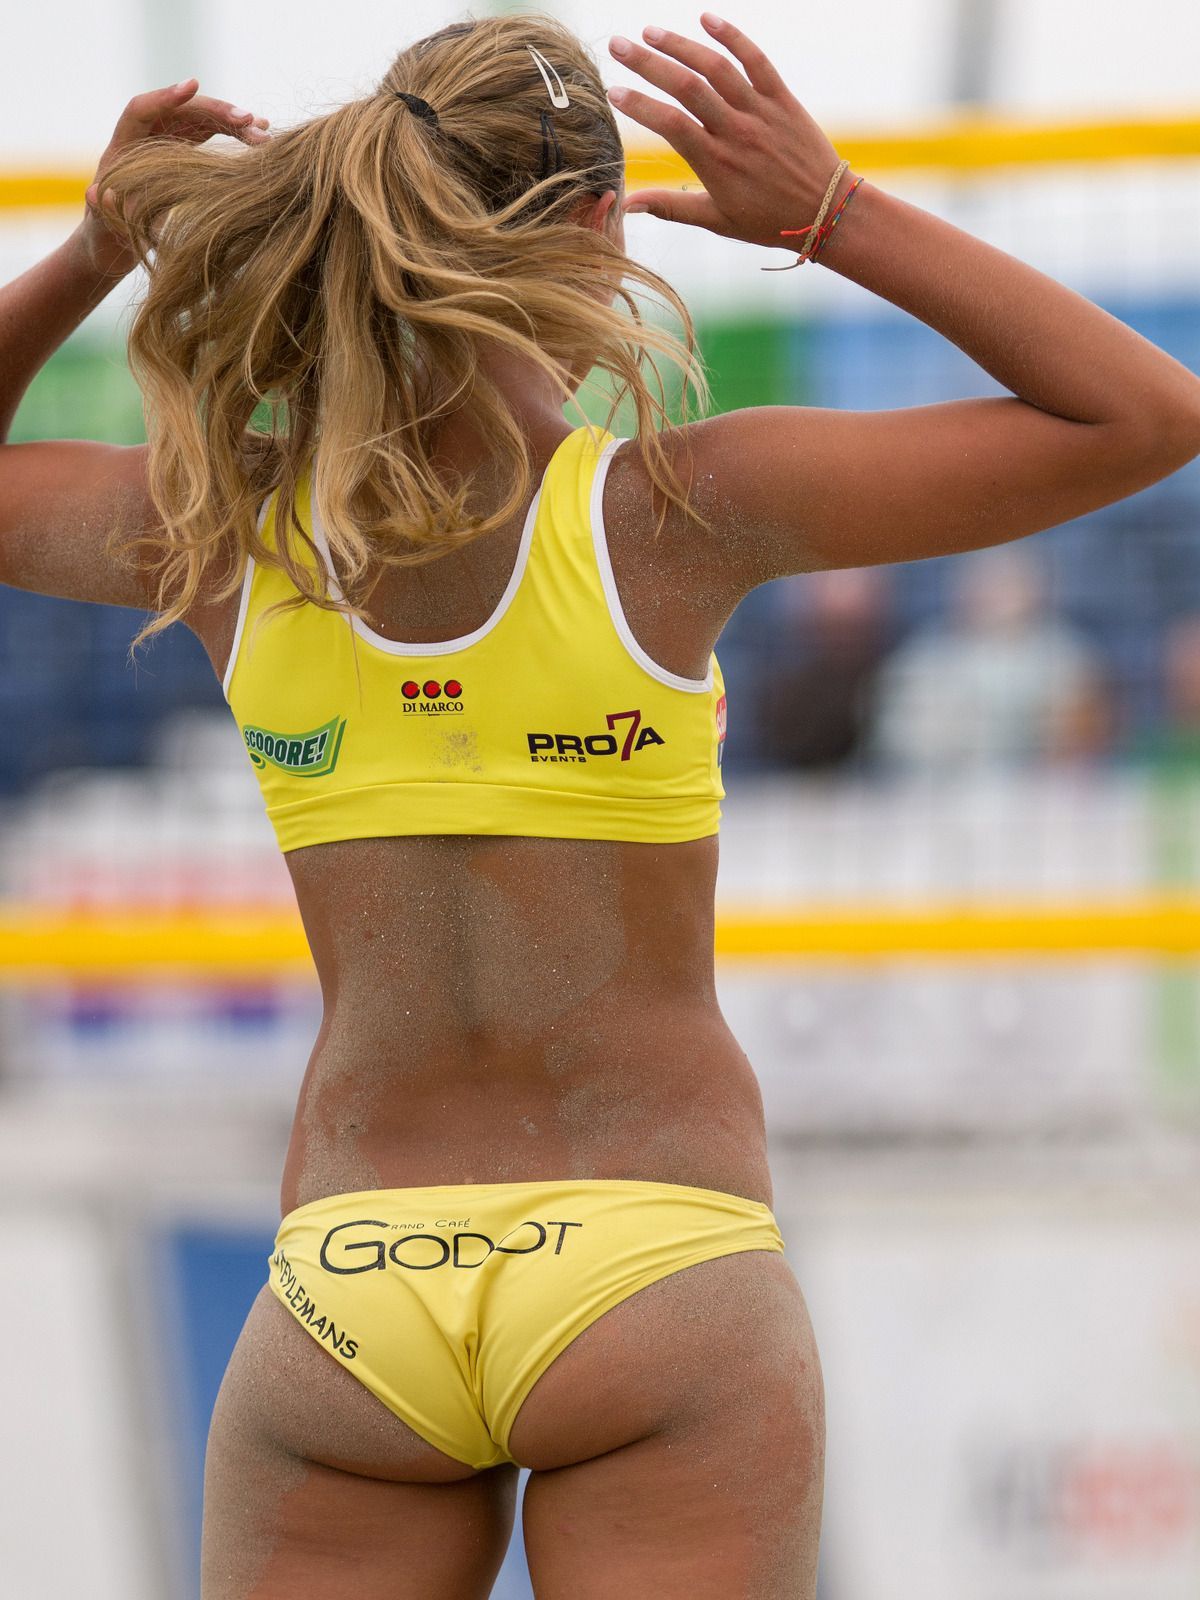 womens-beach-volleyball-bikini-pics